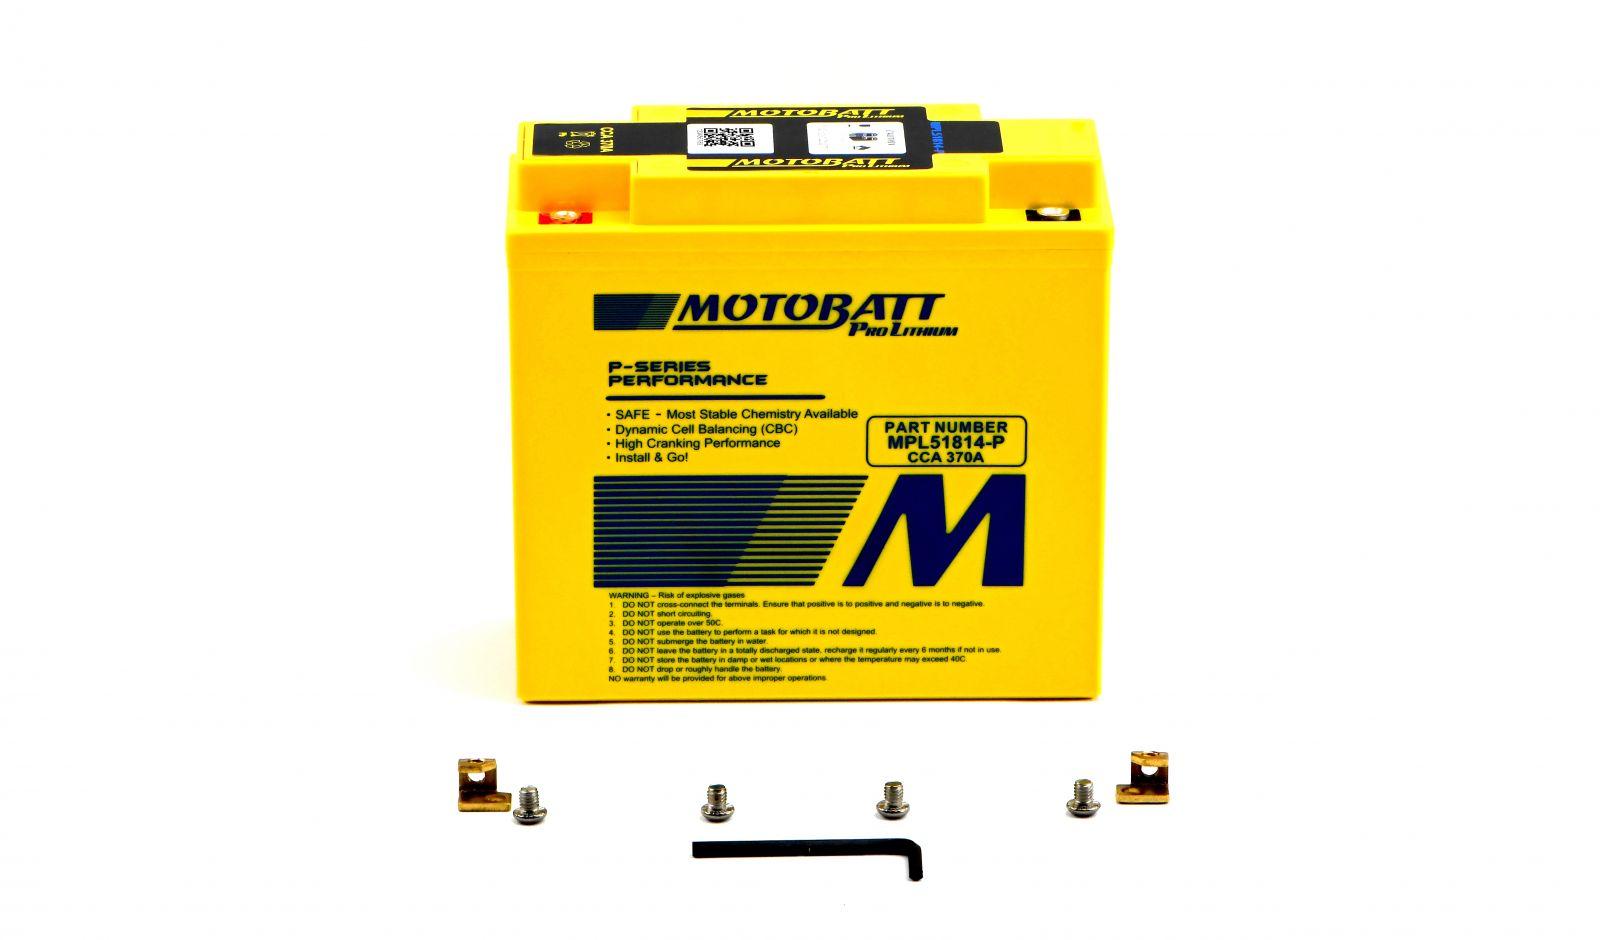 Motobatt Lithium Batteries - 501186ML image